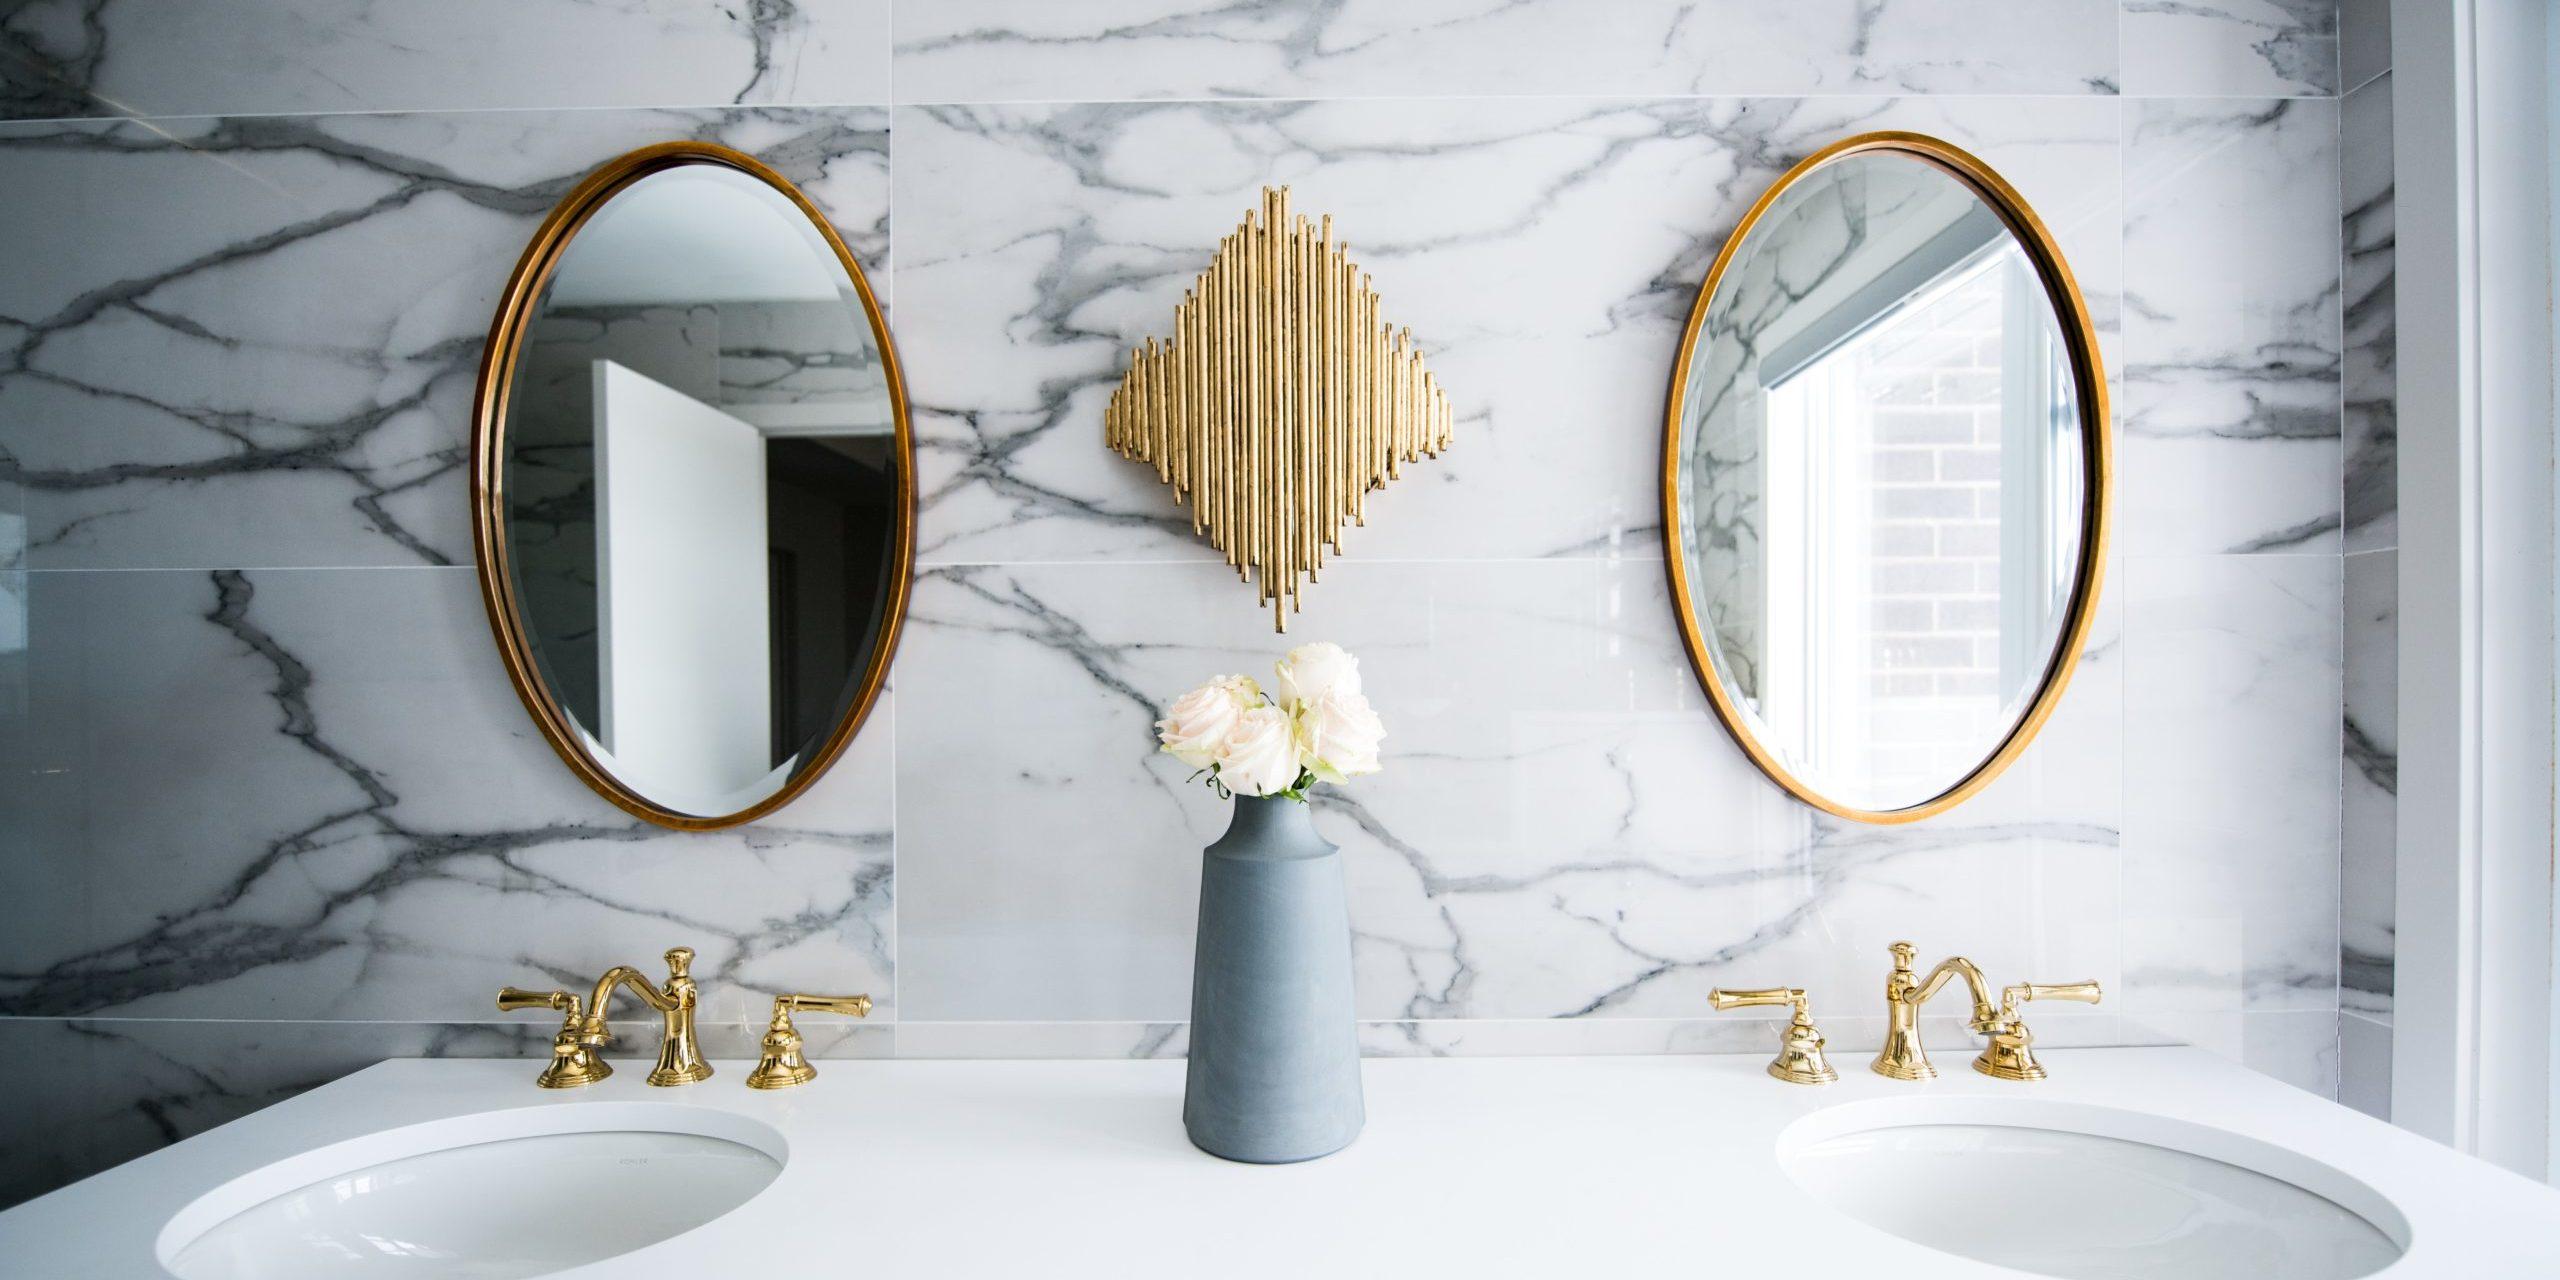 bathroom remodel ideas that add value